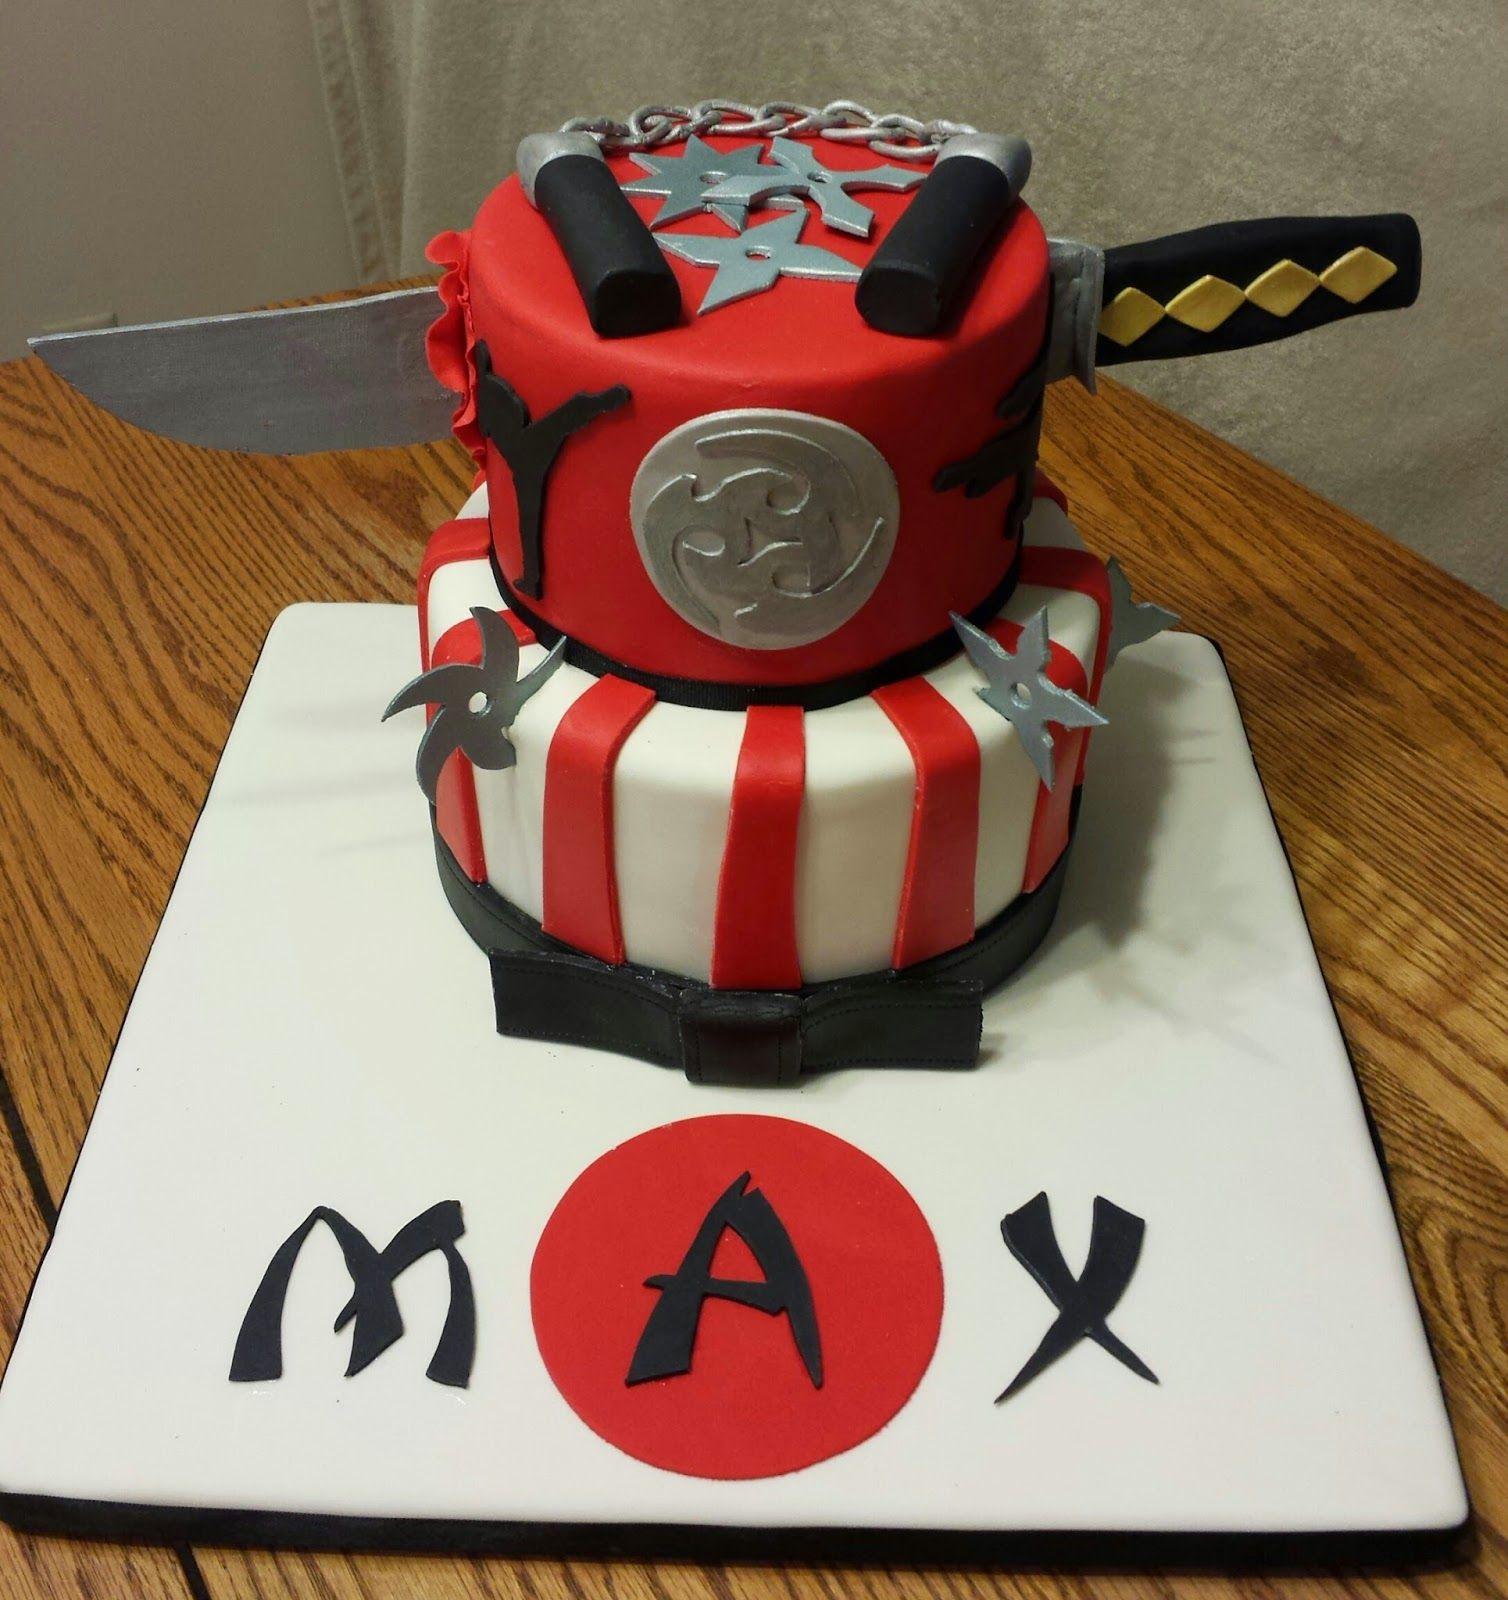 Ninja Birthday Cake cakepins.com | Birthday ideas in 2019 | Ninja ...